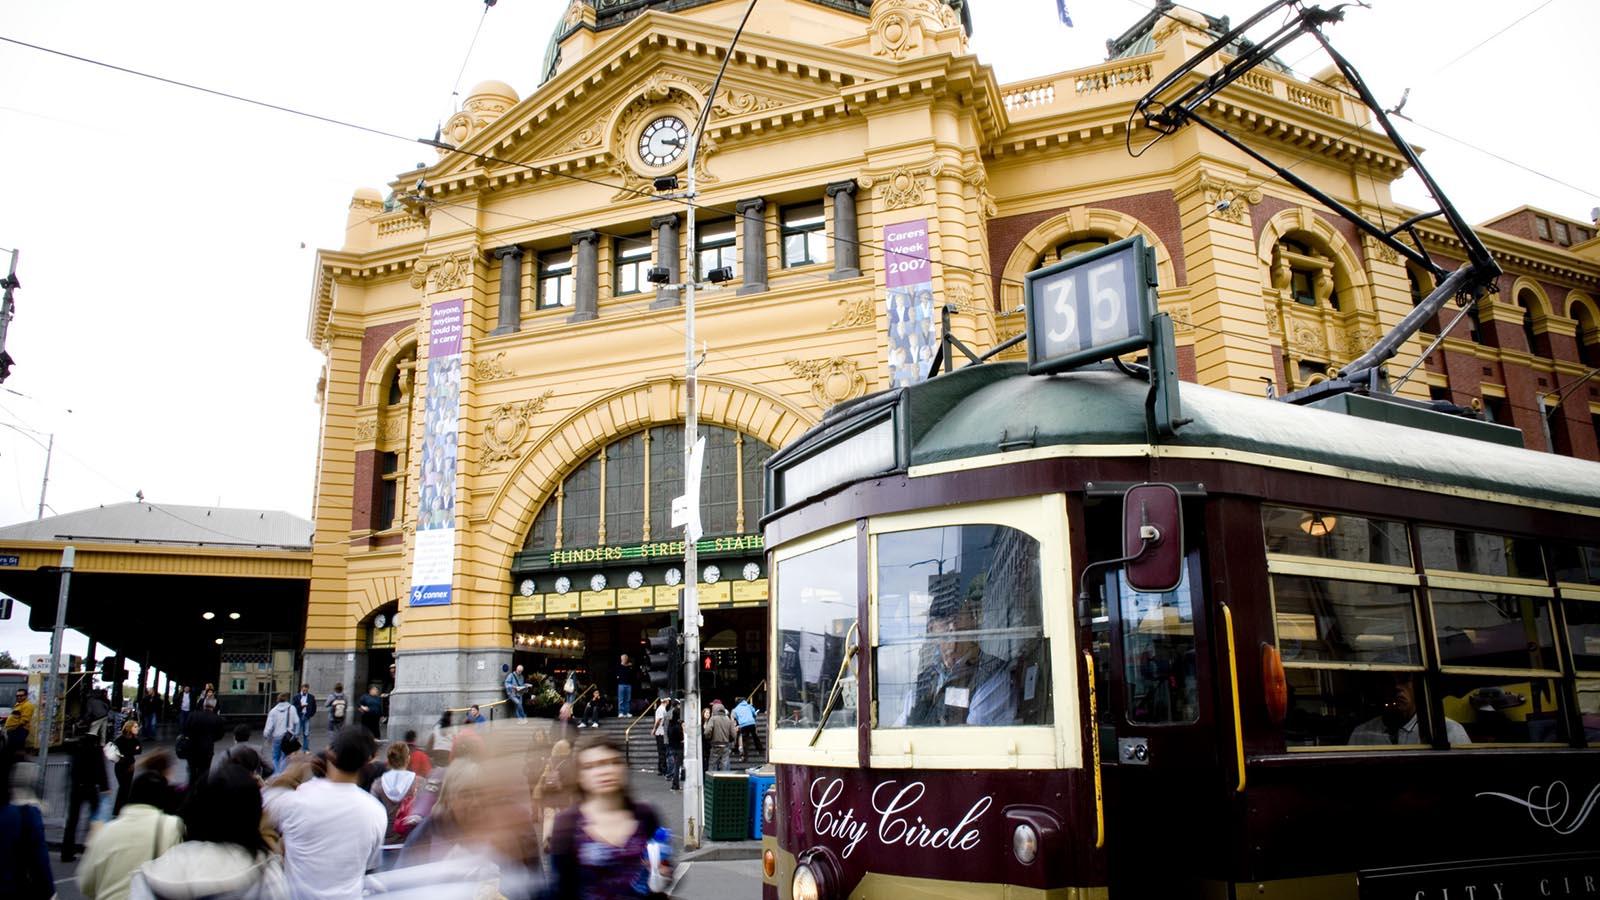 City Circle Tram at Flinders Street Station, Melbourne, Victoria, Australia